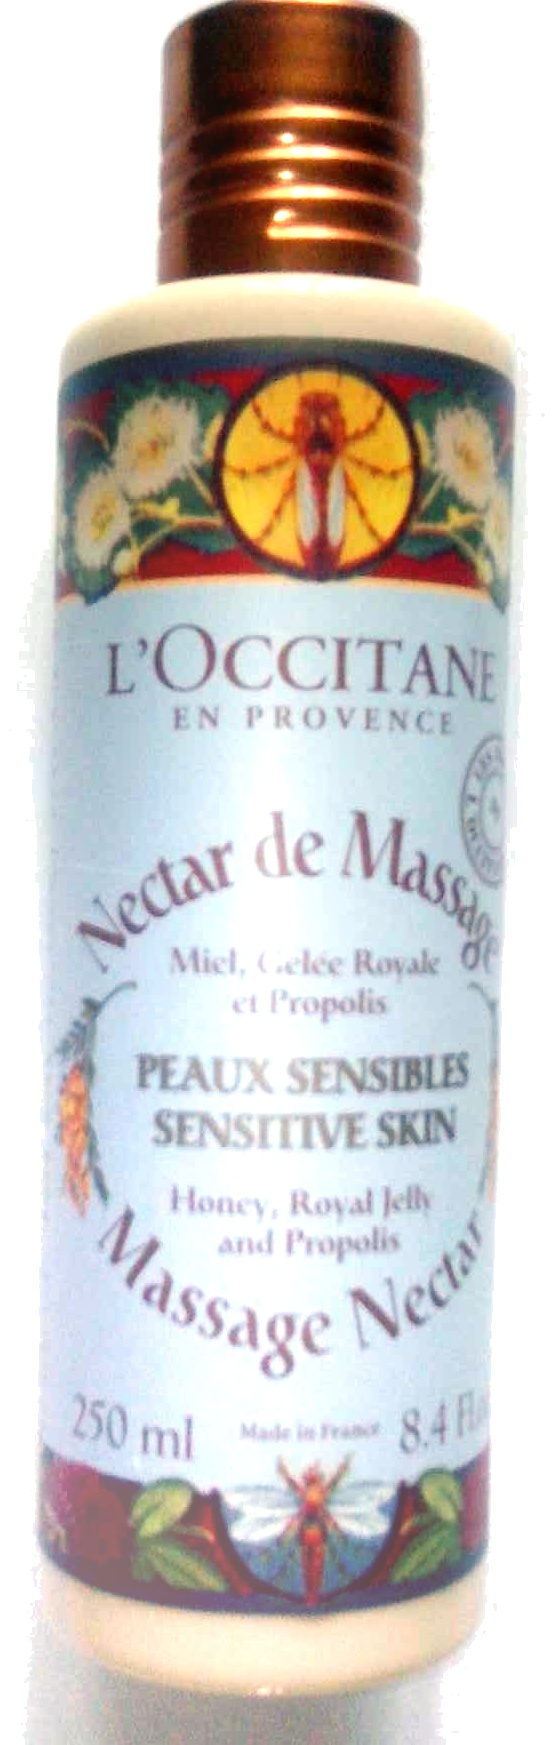 Nectar de Massage - Product - fr